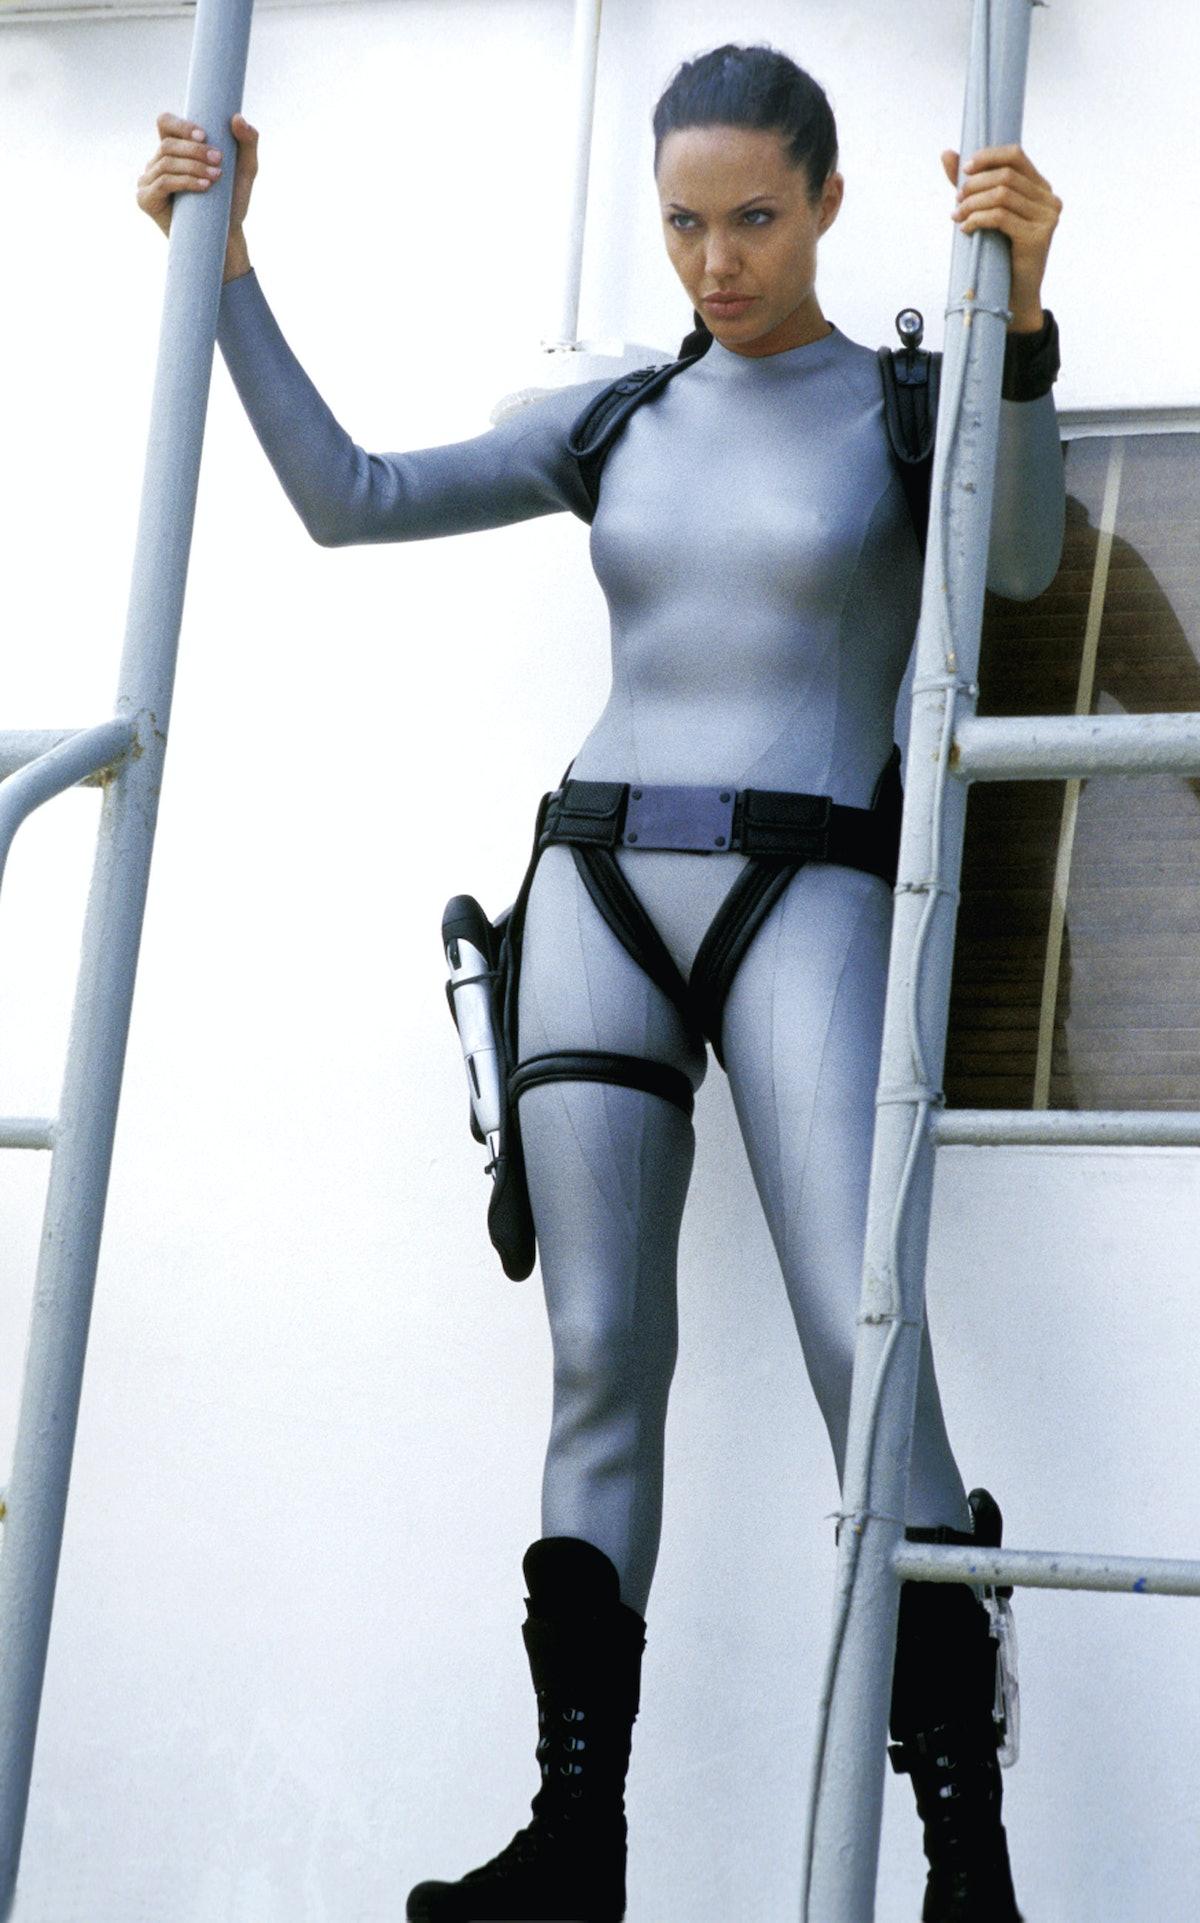 LARA CROFT TOMB RAIDER: THE CRADLE OF LIFE, Angelina Jolie, 2003, (c) Paramount/courtesy Everett Col